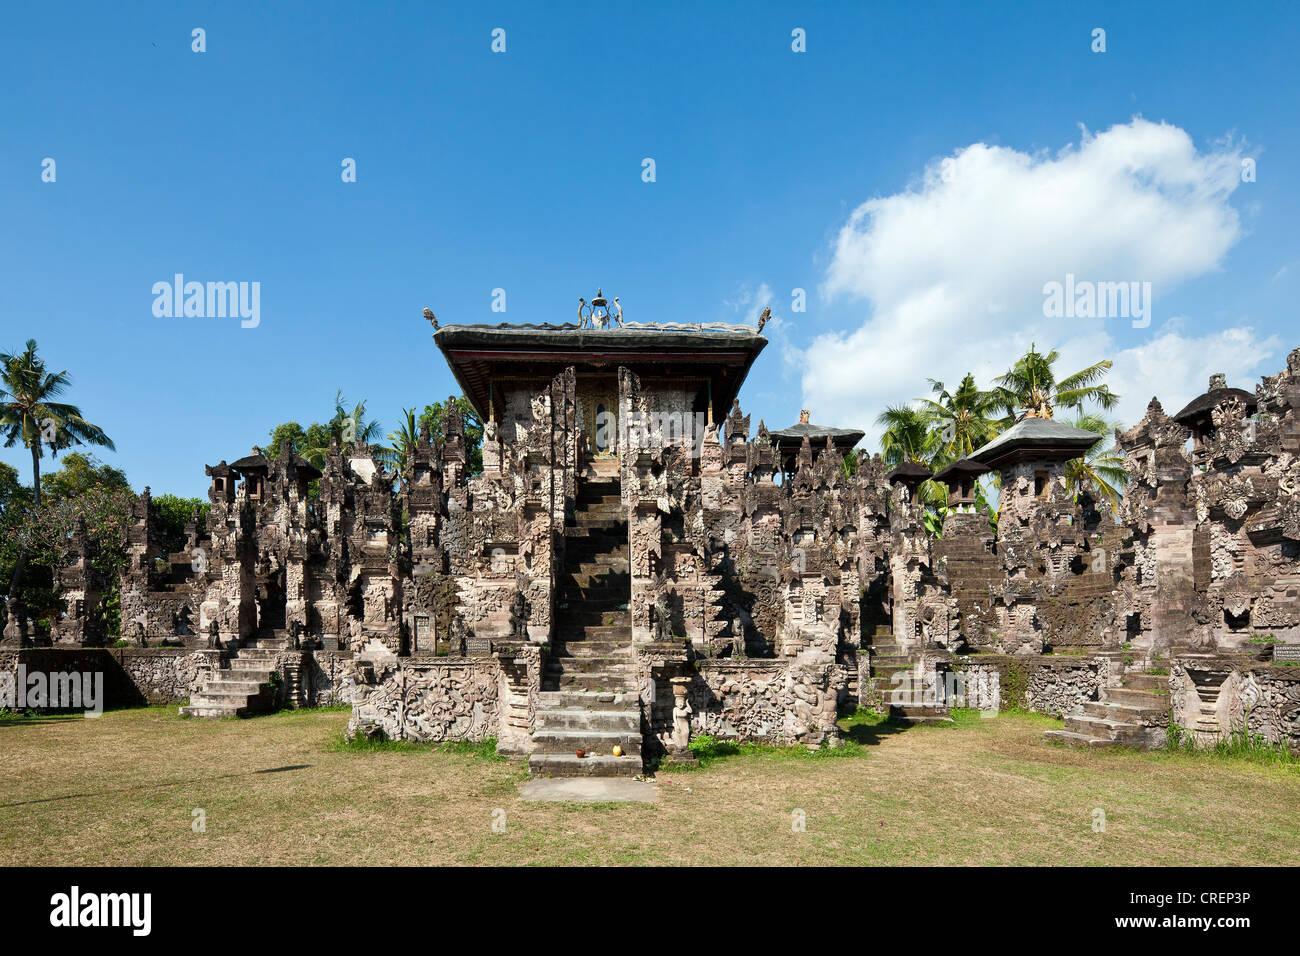 Pura Beji Temple, Sangsit, northern Bali, Bali, Indonesia, Southeast Asia - Stock Image